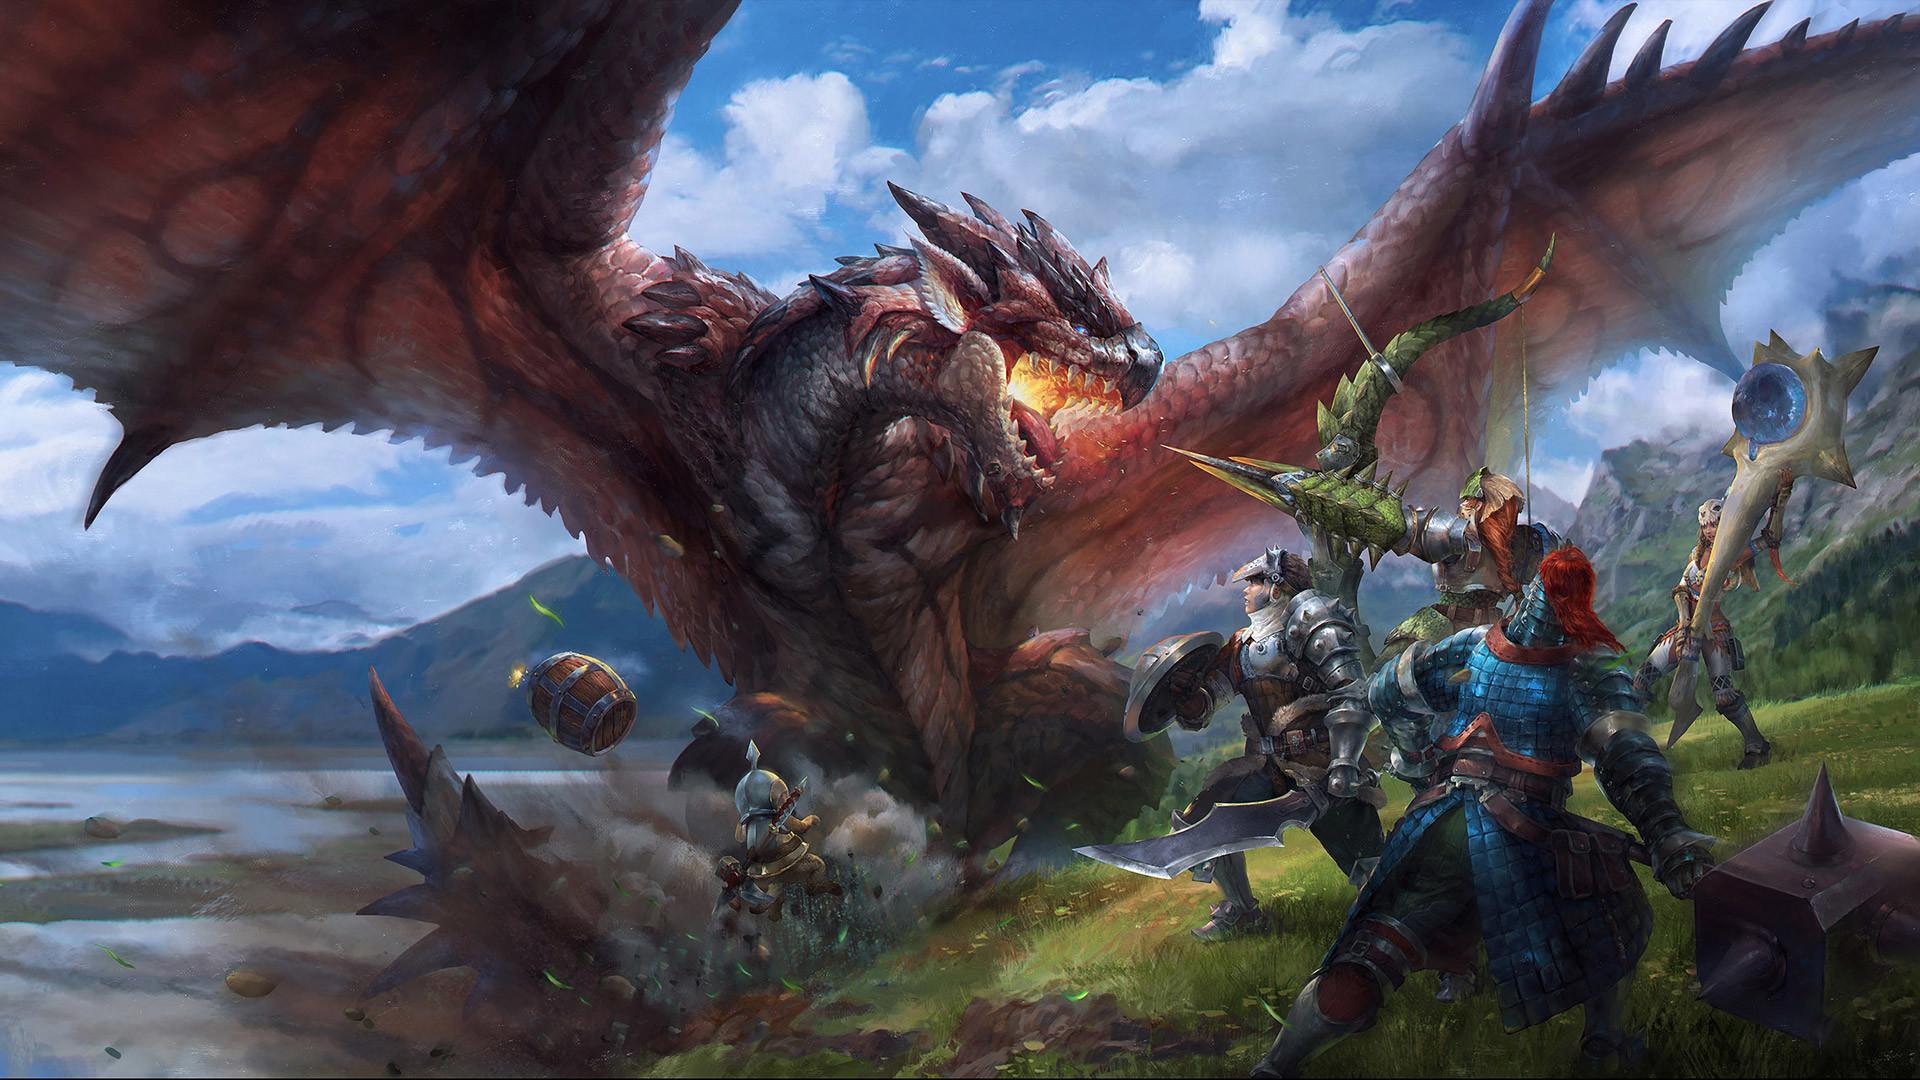 1080p monster hunter wallpaper hd